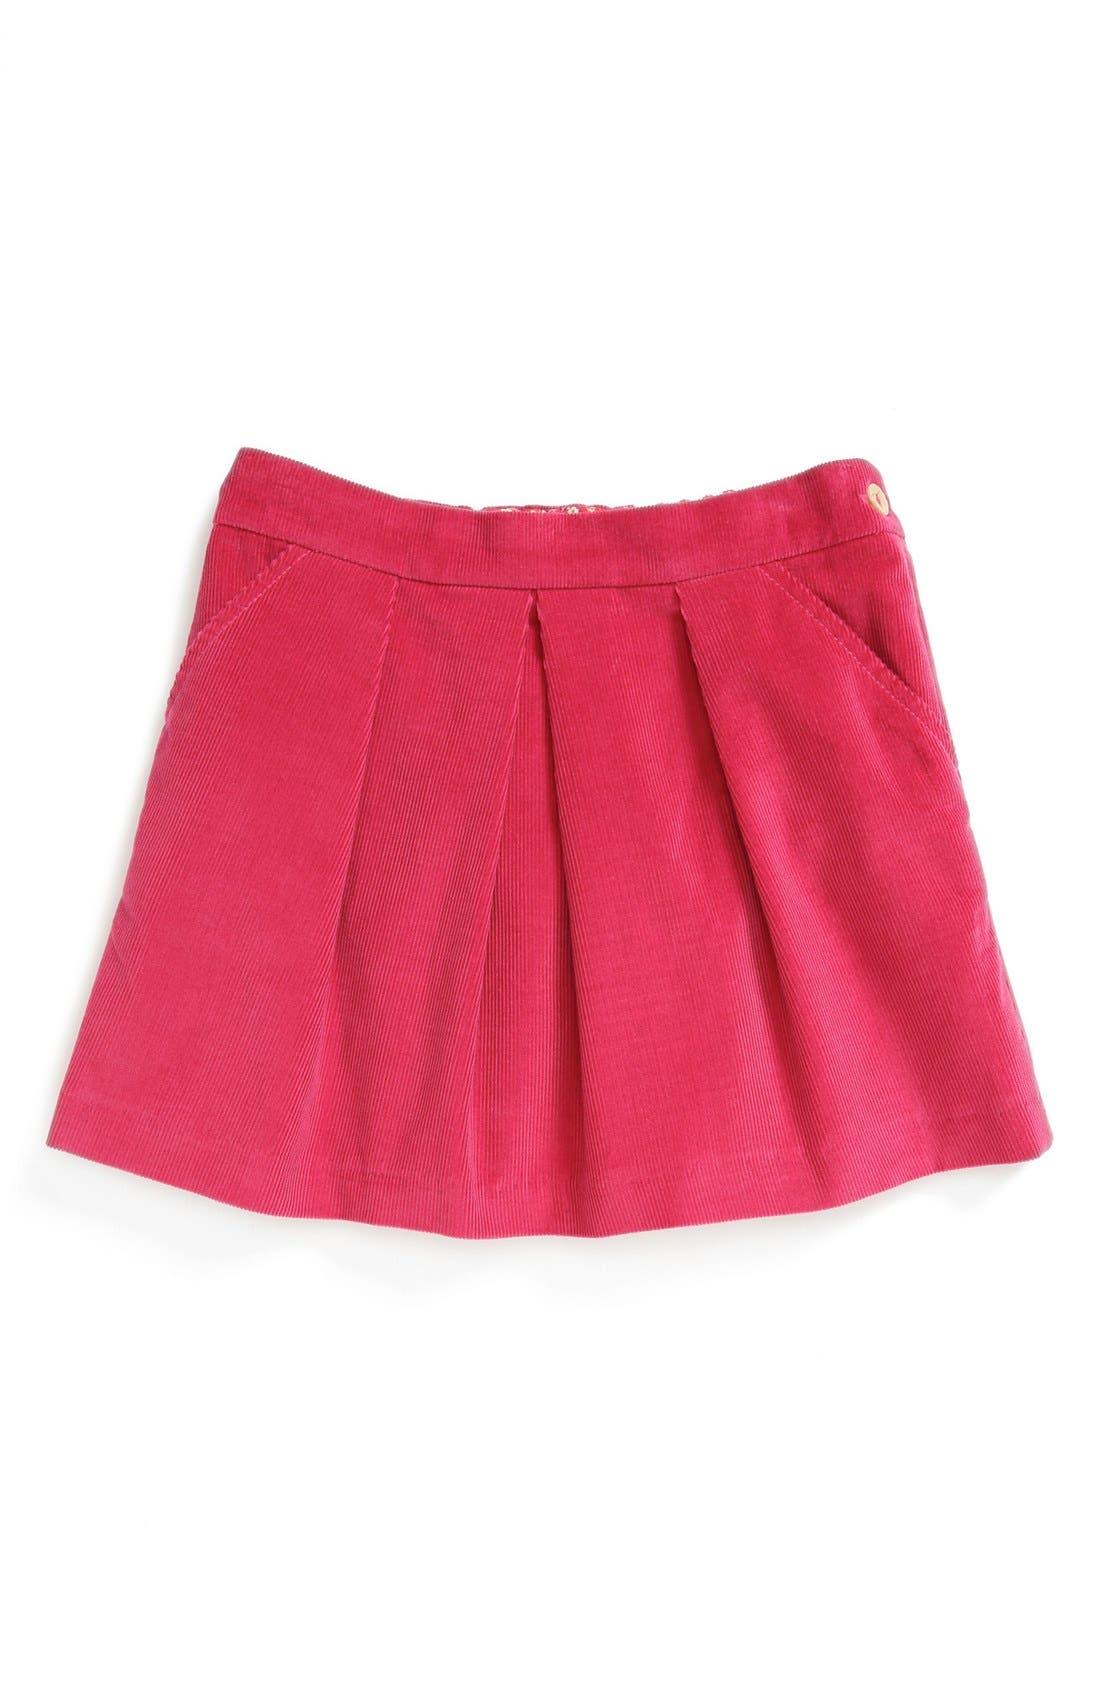 Main Image - Oscar de la Renta Corduroy Miniskirt (Little Girls & Big Girls)